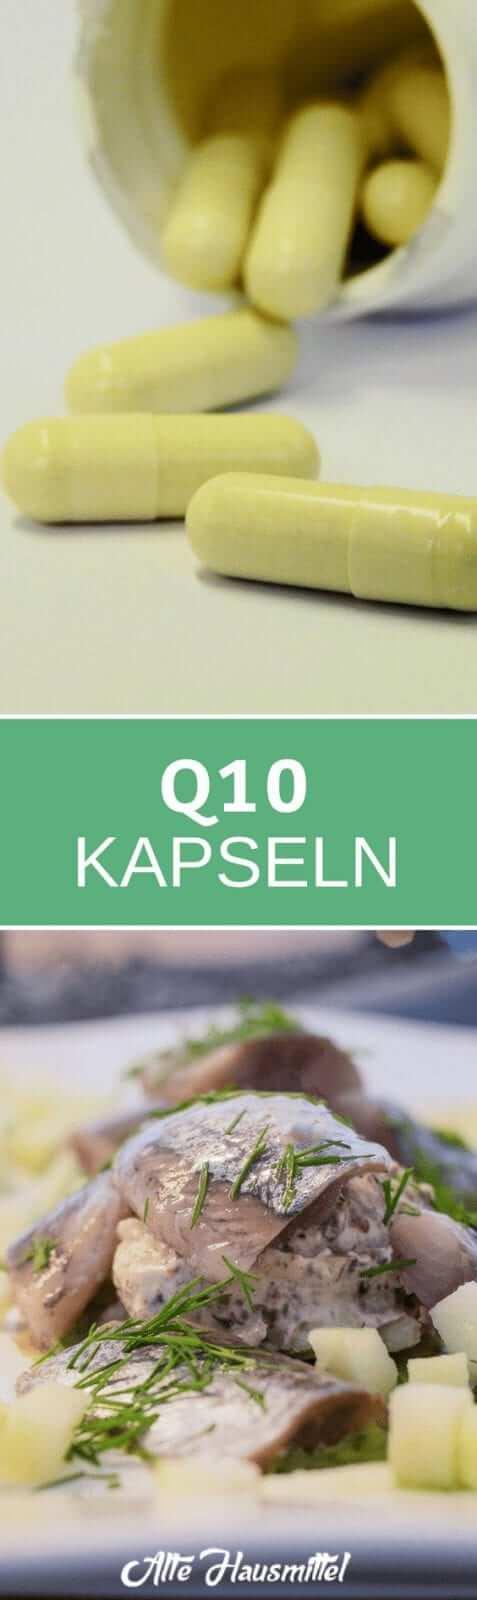 Q10 Kapseln als Anti Aging & Antioxidationsmittel